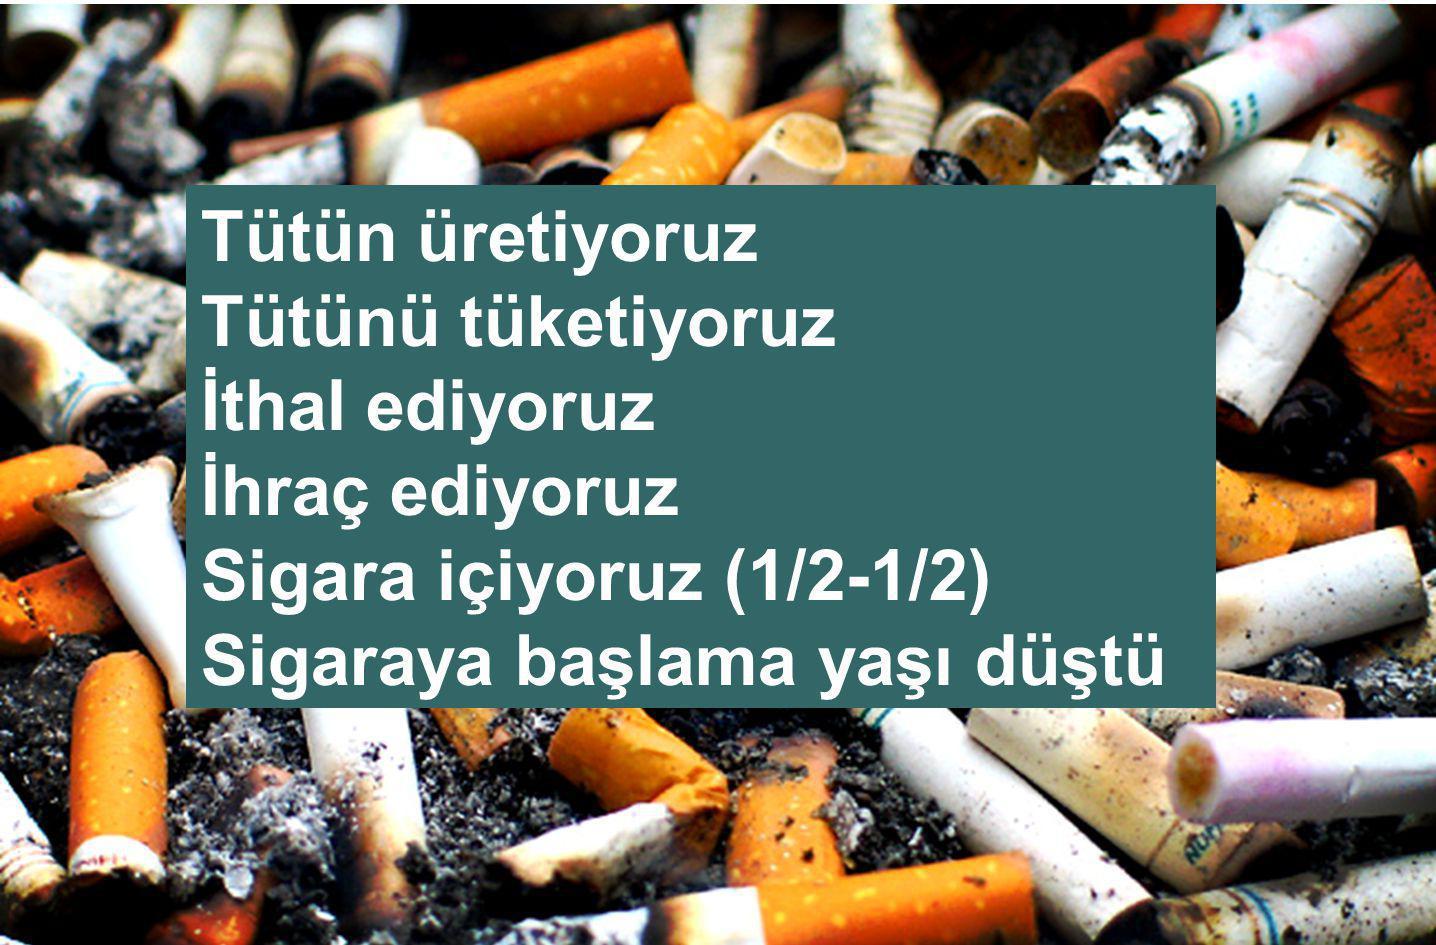 KÜRESELLEŞME & SİGARA ASH, Tobacco: Global Trends, 2006.